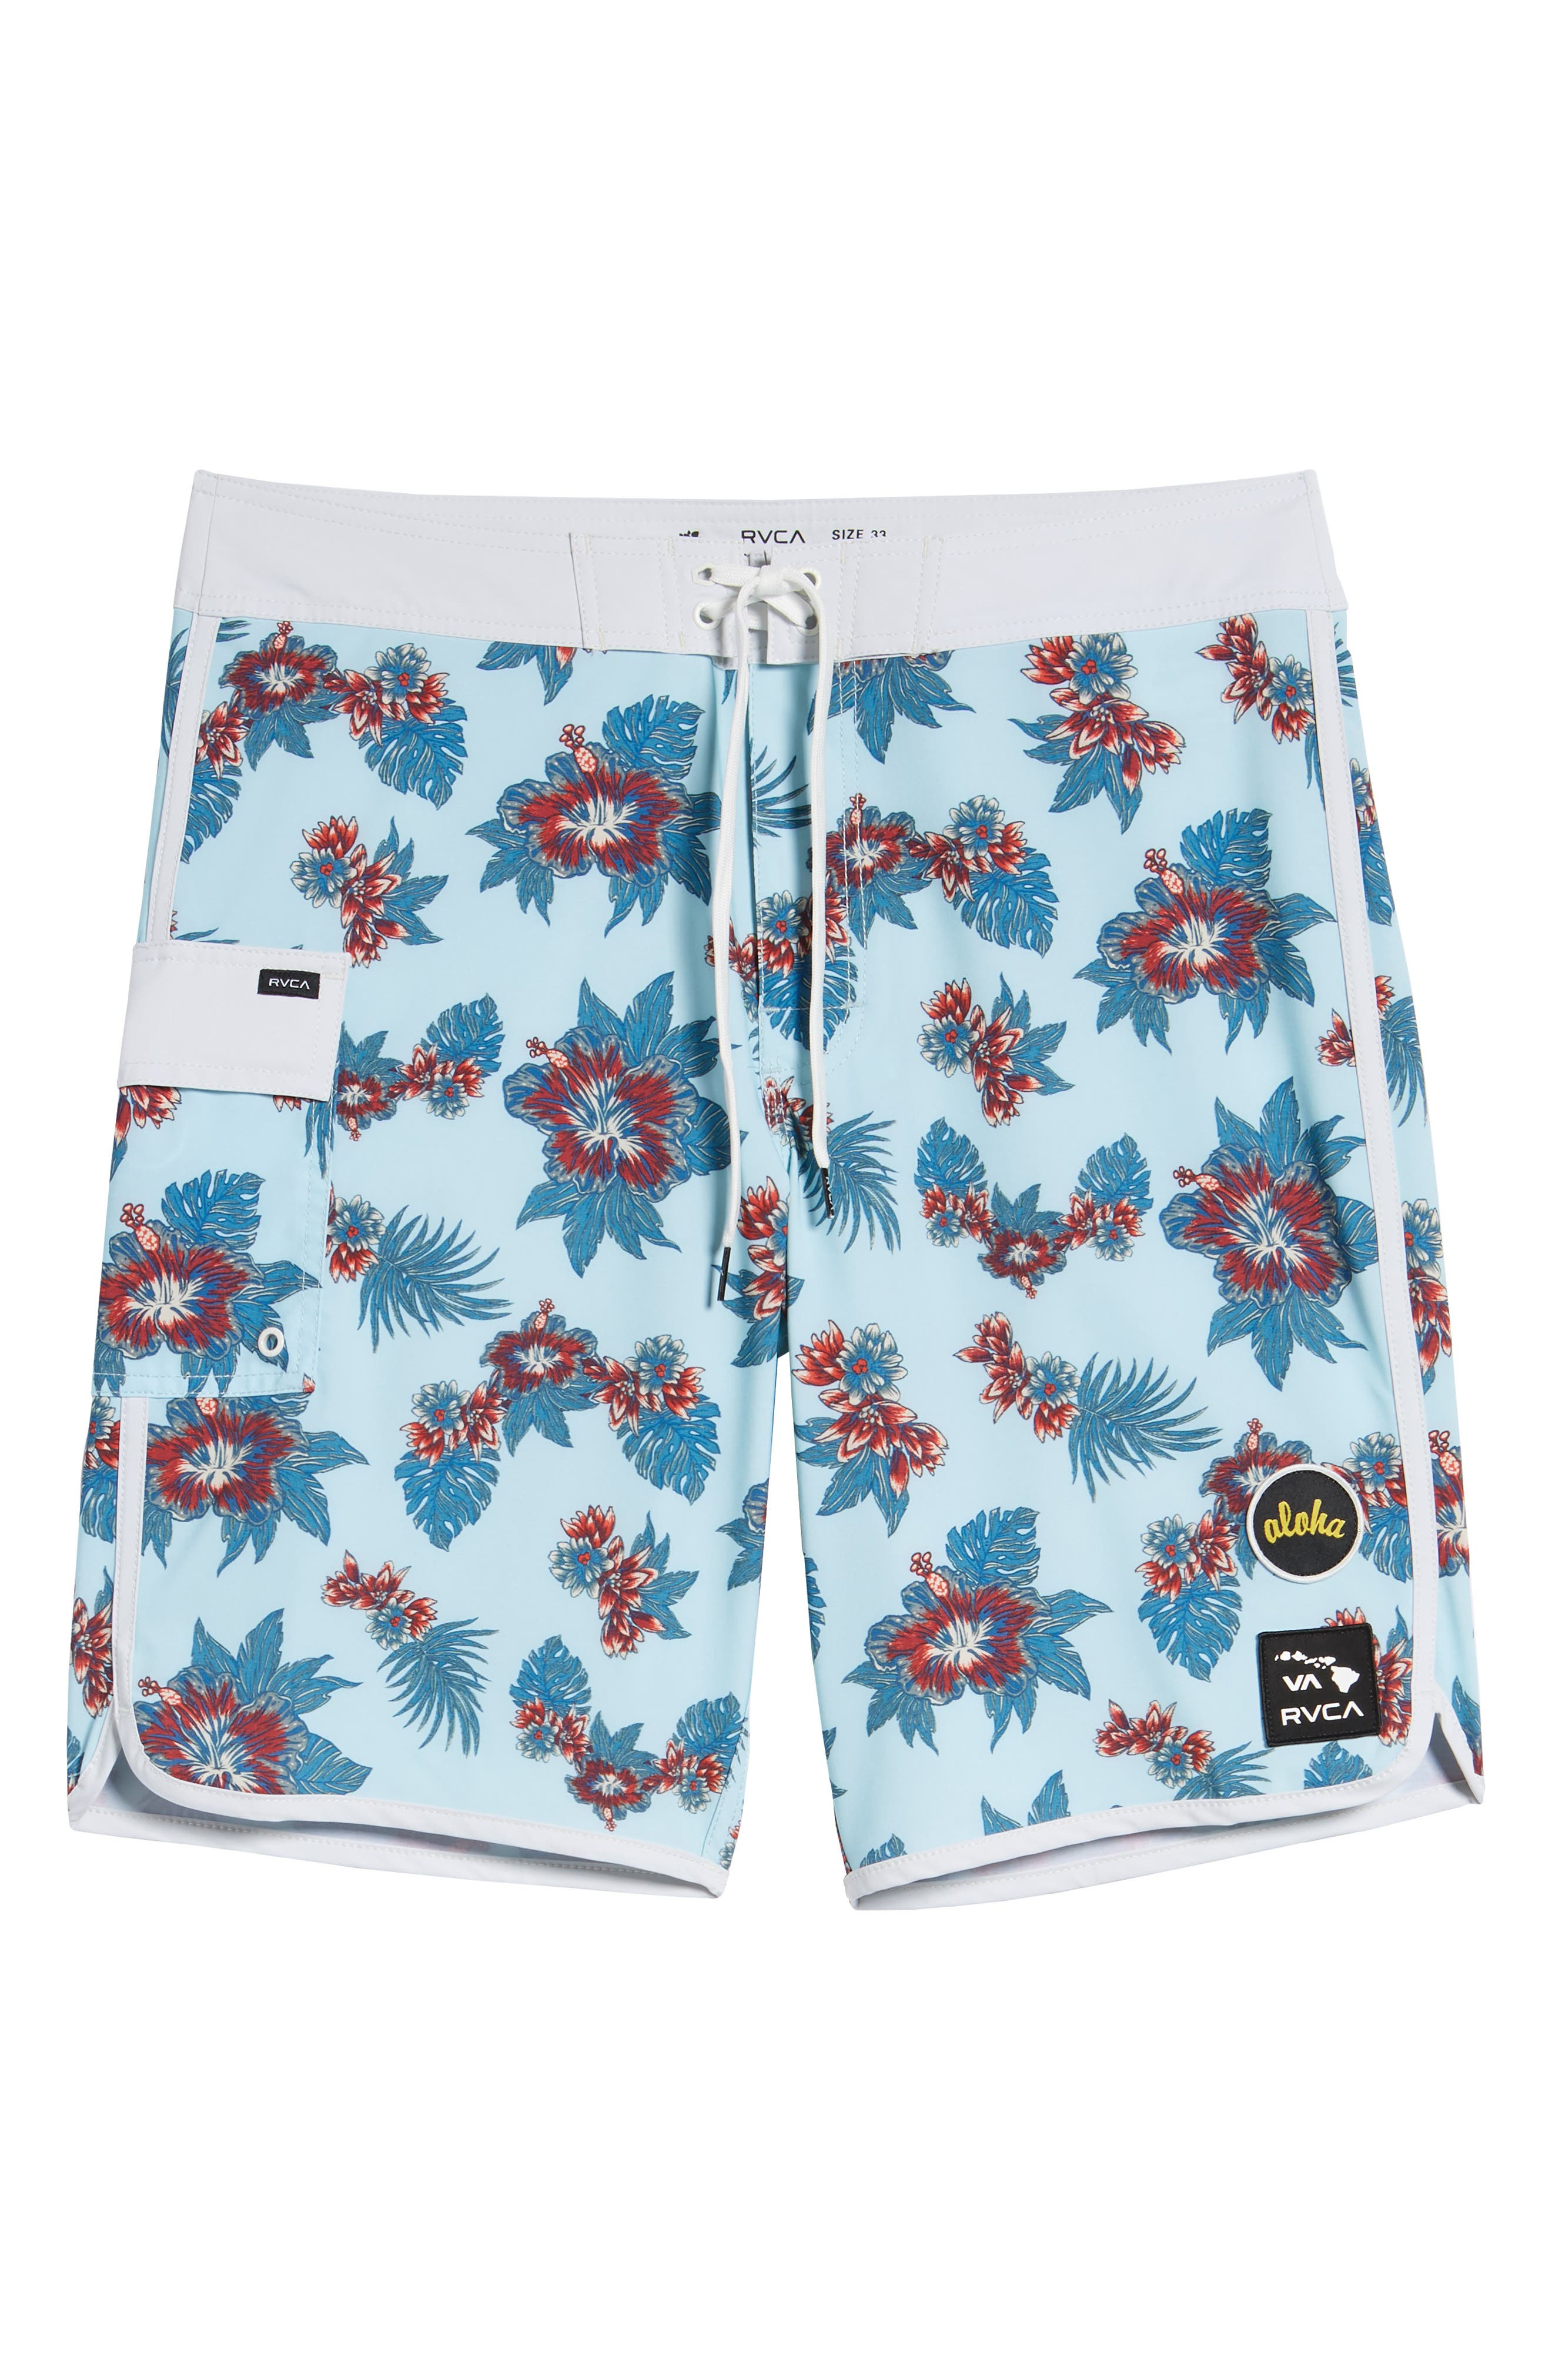 Jeff McMillan Floral Swim Trunks,                             Alternate thumbnail 6, color,                             BLUE FLORAL